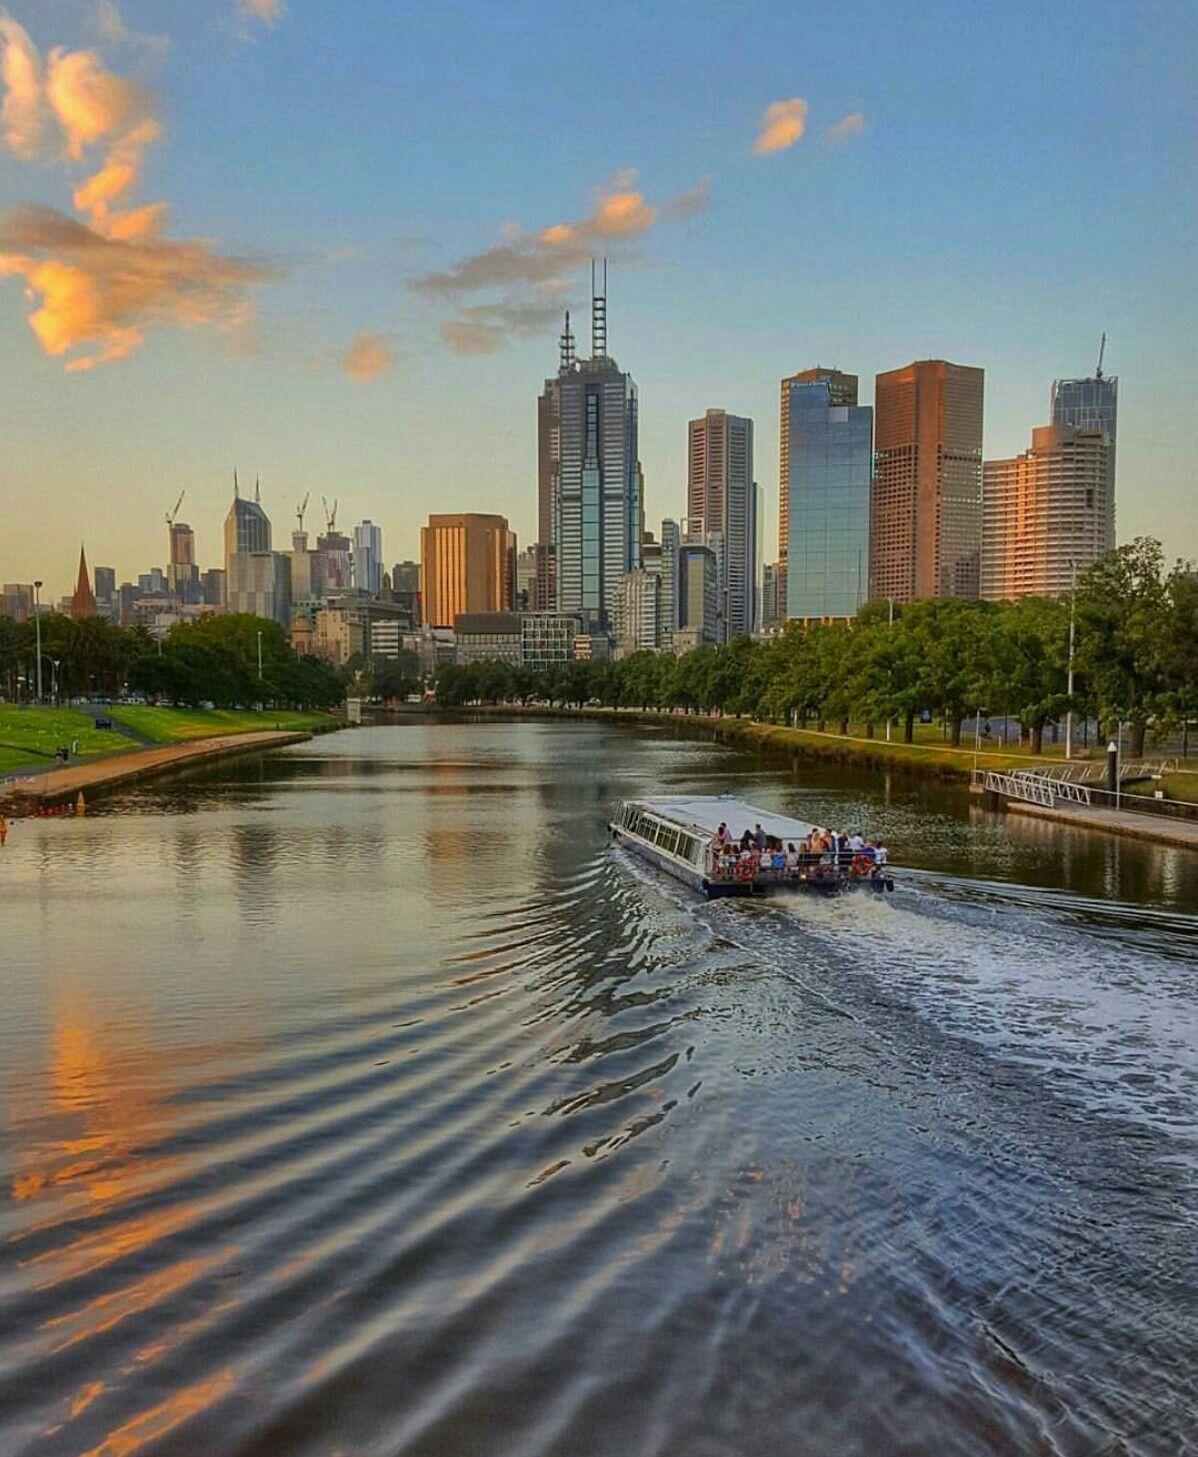 My visit to Melbourne City 5b3213d832cc86e09b3c2e83391b6e0f